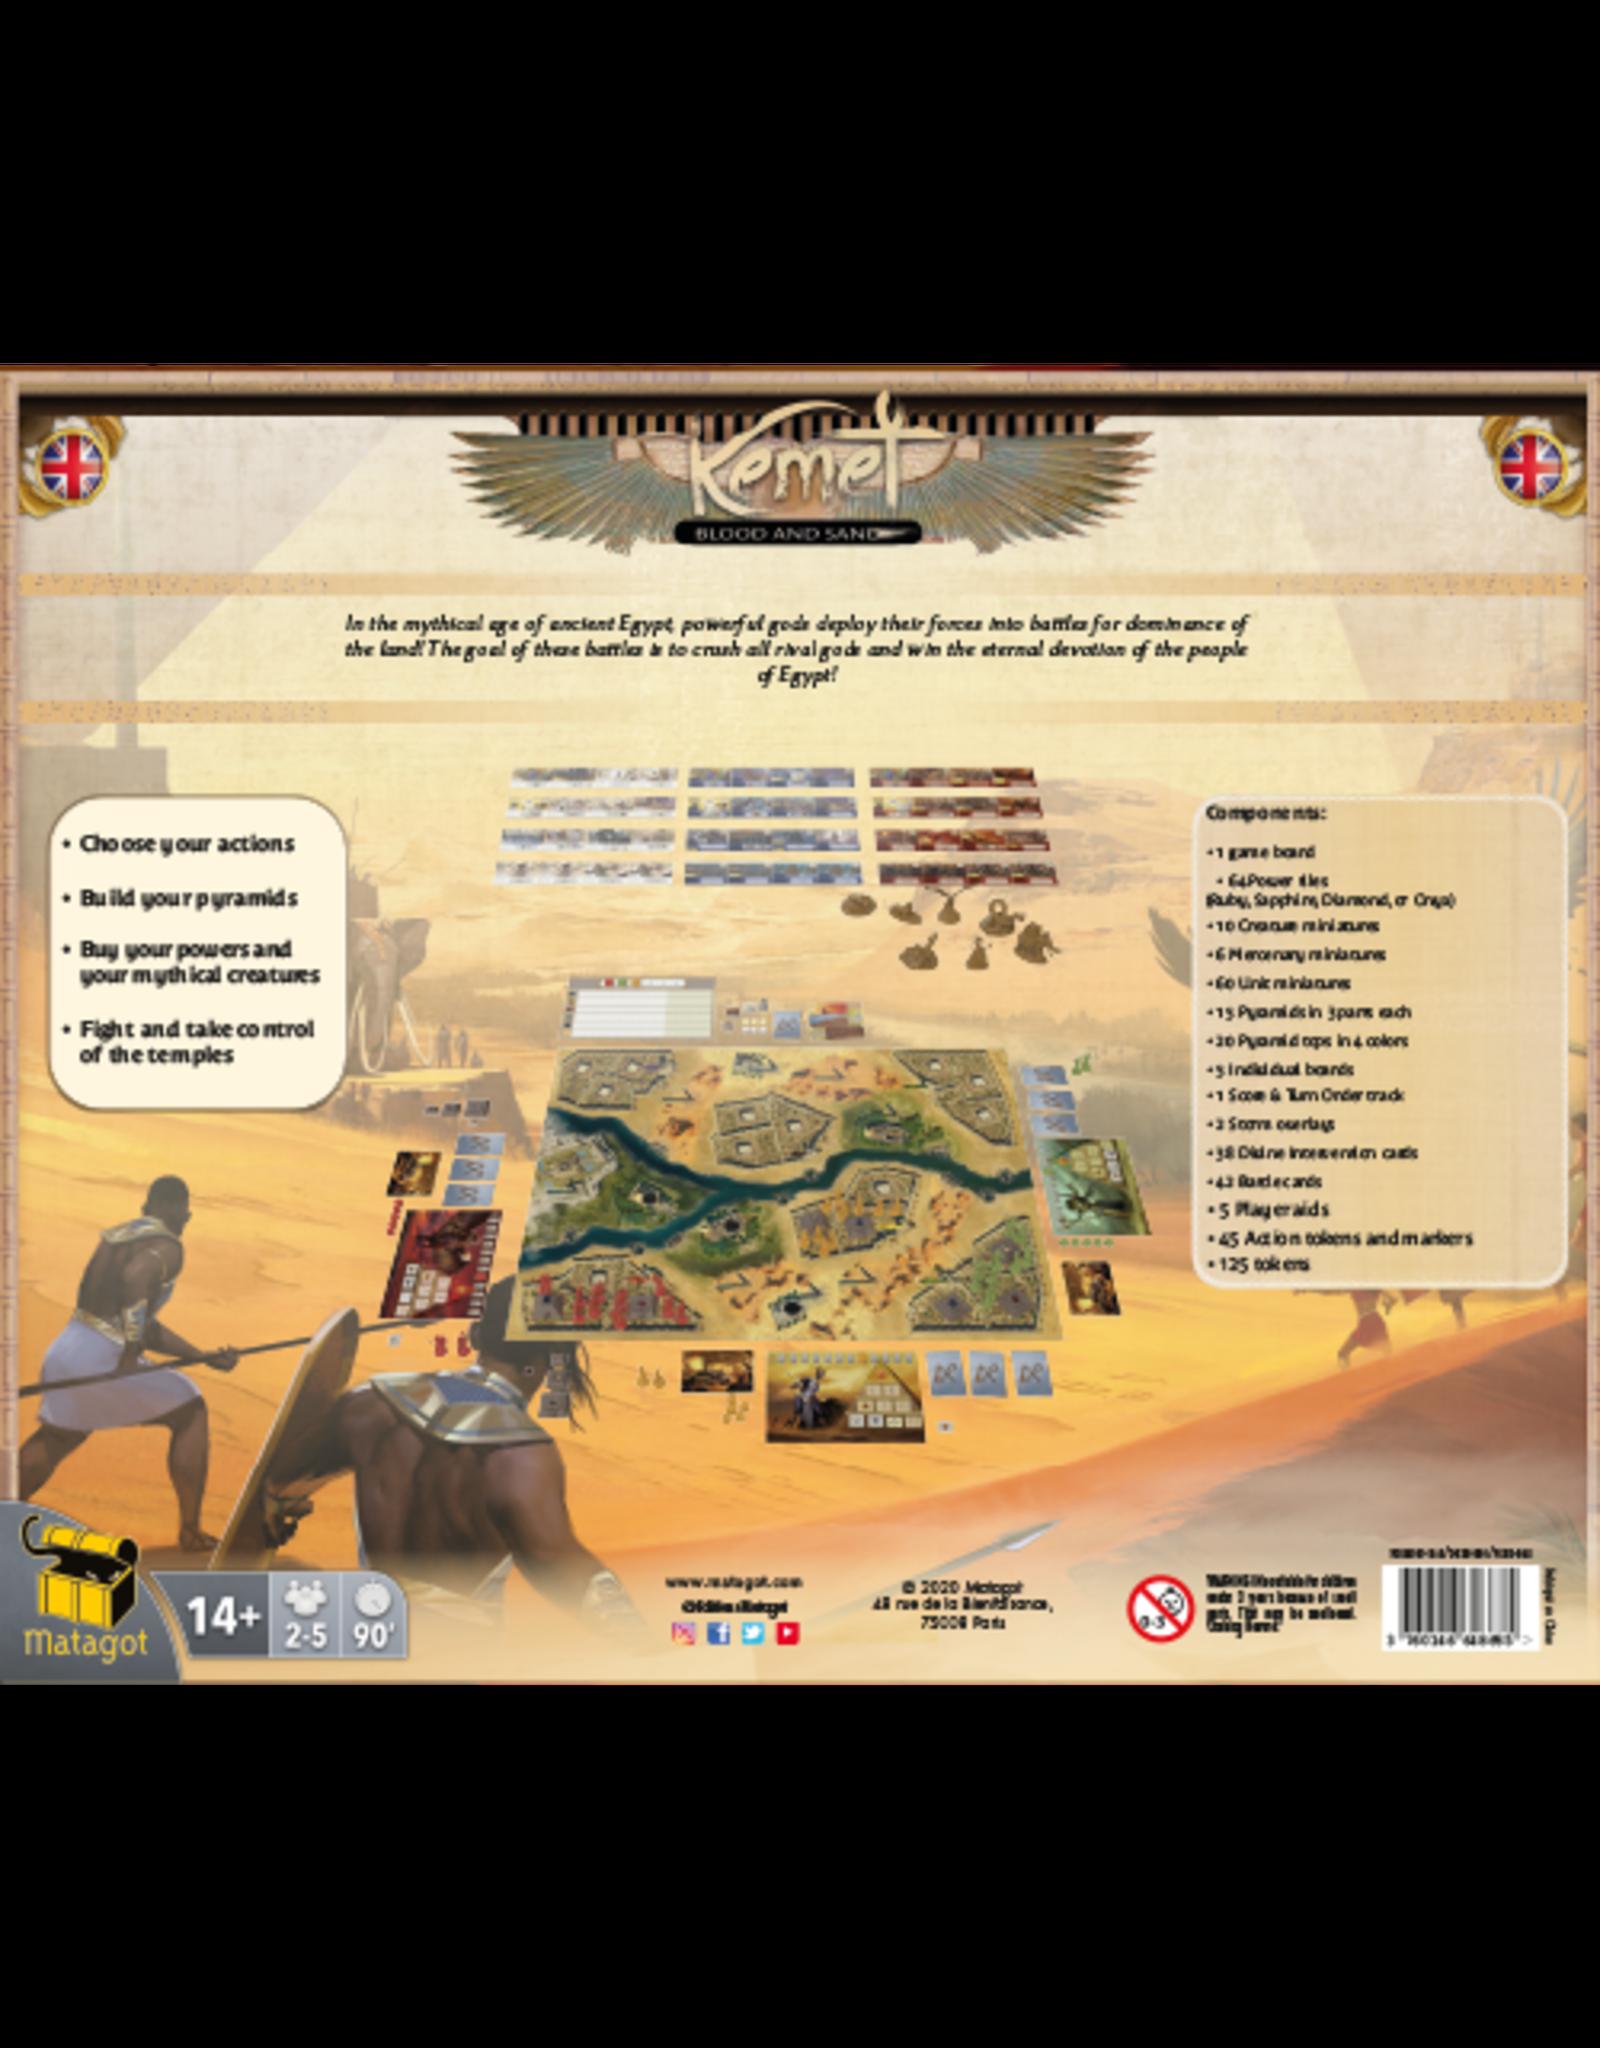 Matagot Kemet: Blood and Sand